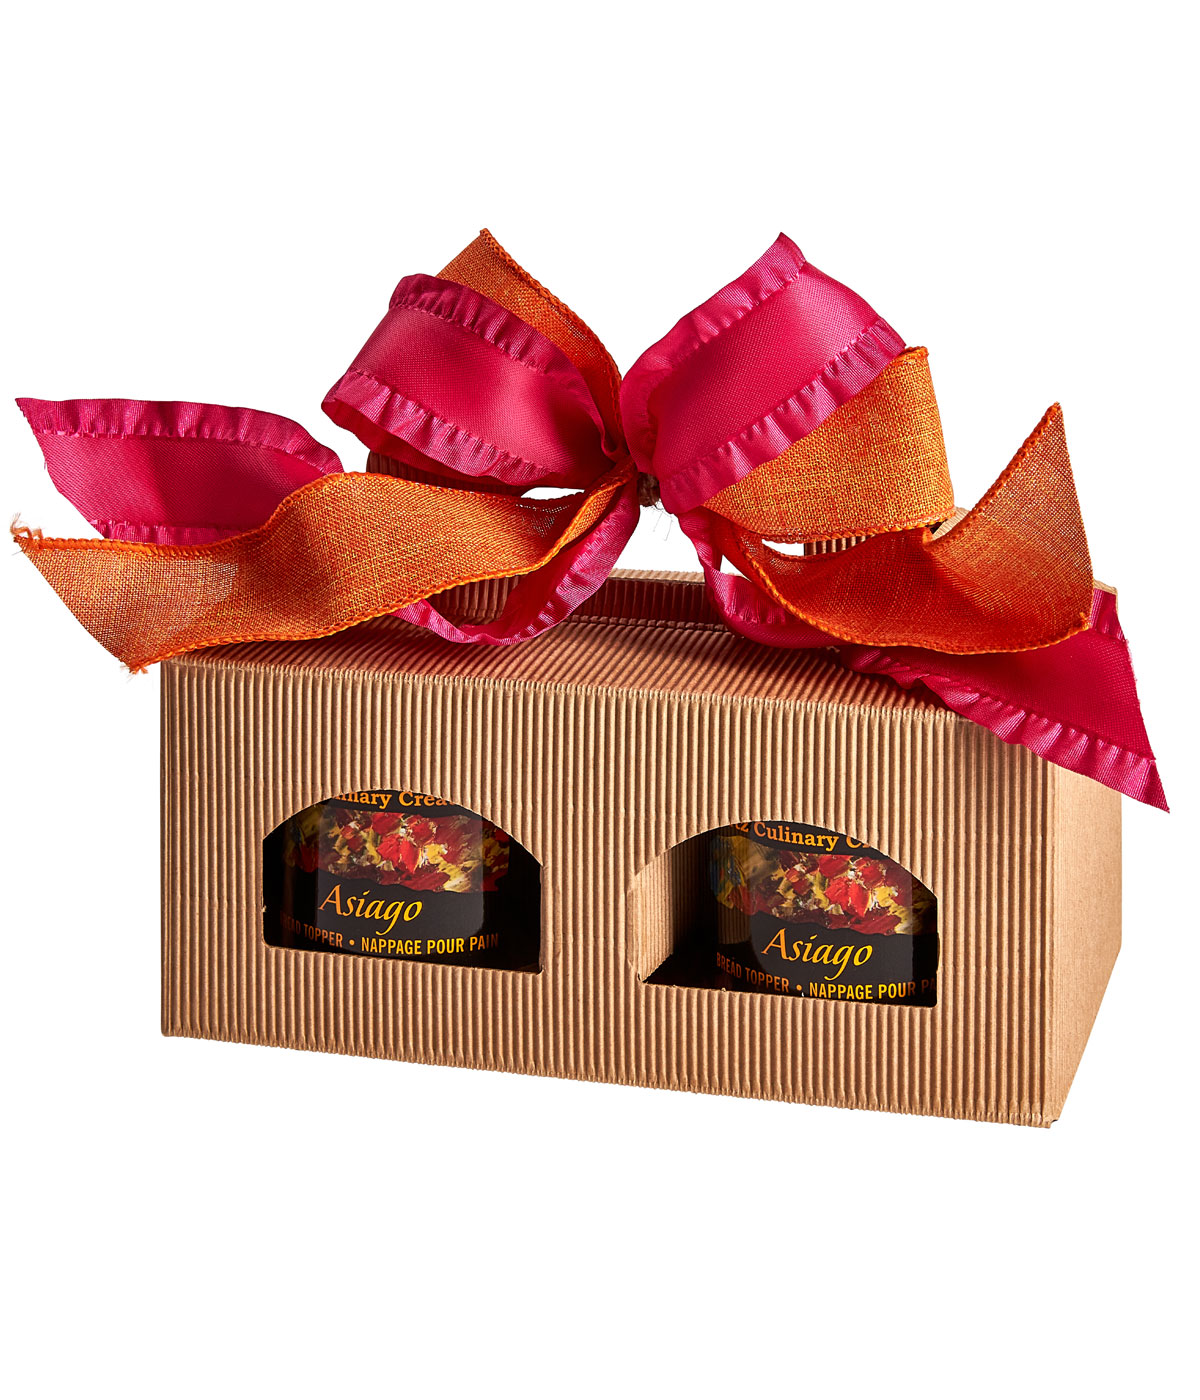 Asiago Bread Topper Pair: Gift Box